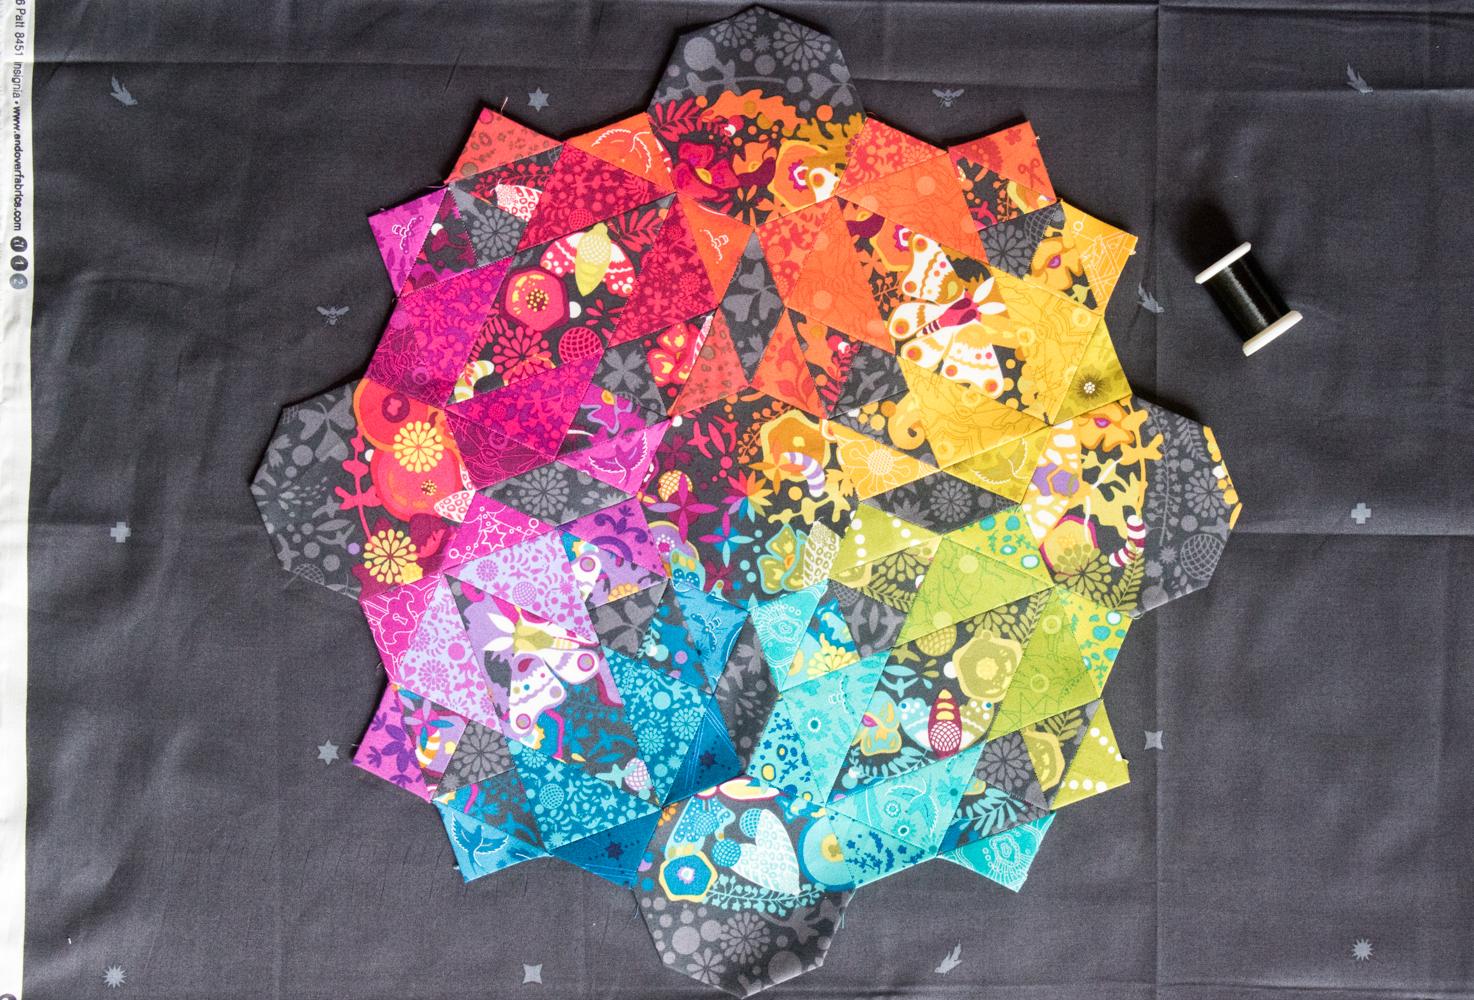 alison glass rainbow moonstone giucy giuce epp pattern